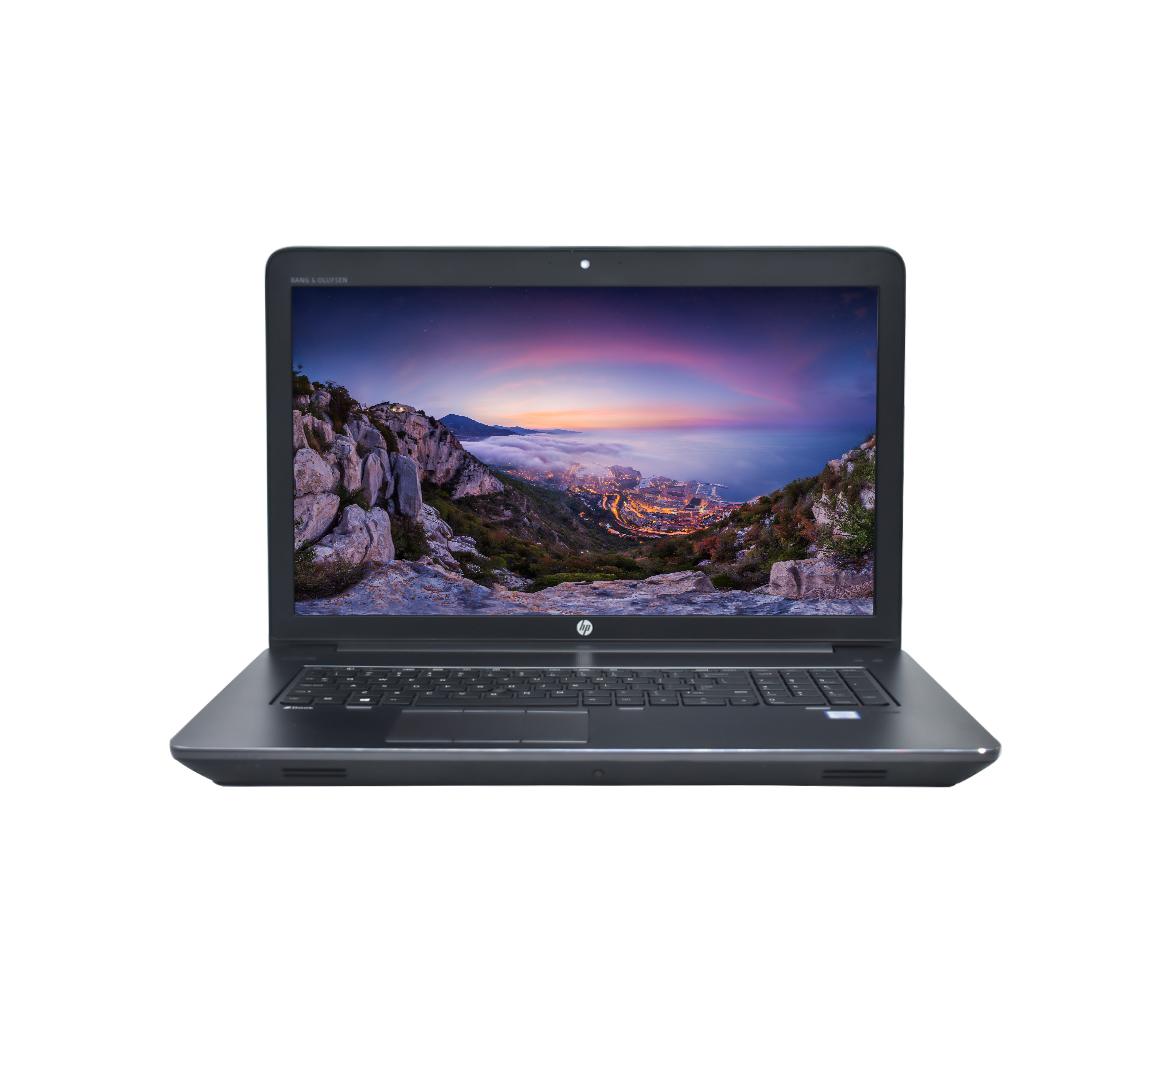 HP ZBook 17 G3 Business Laptop, Intel Core i7 6th-Gen CPU, 16GB DDR4 SODIMM RAM, 512GB SSD, 17 inch Display, Windows 10 Pro (Refurbished)